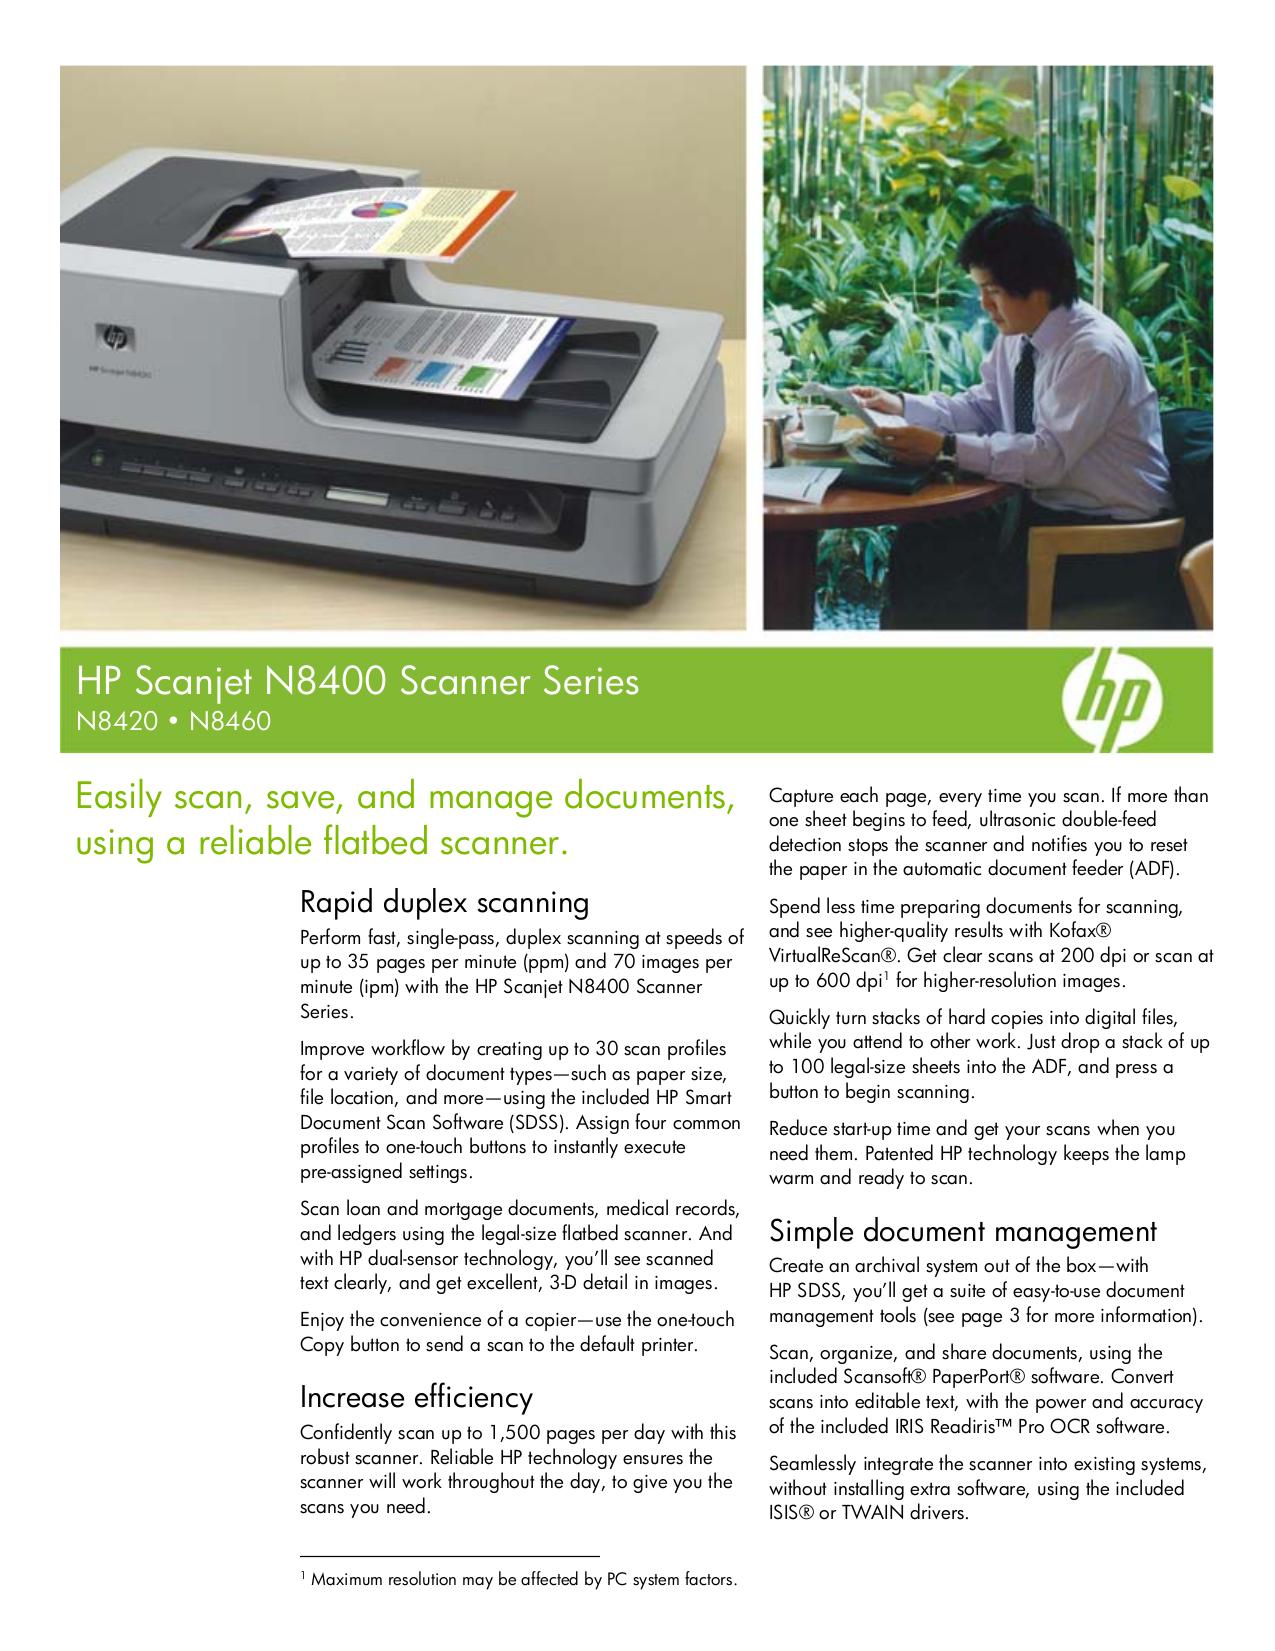 download free pdf for hp scanjet 8300 scanner manual rh umlib com hp scanjet 8300 service manual hp scanjet 8300 instructions